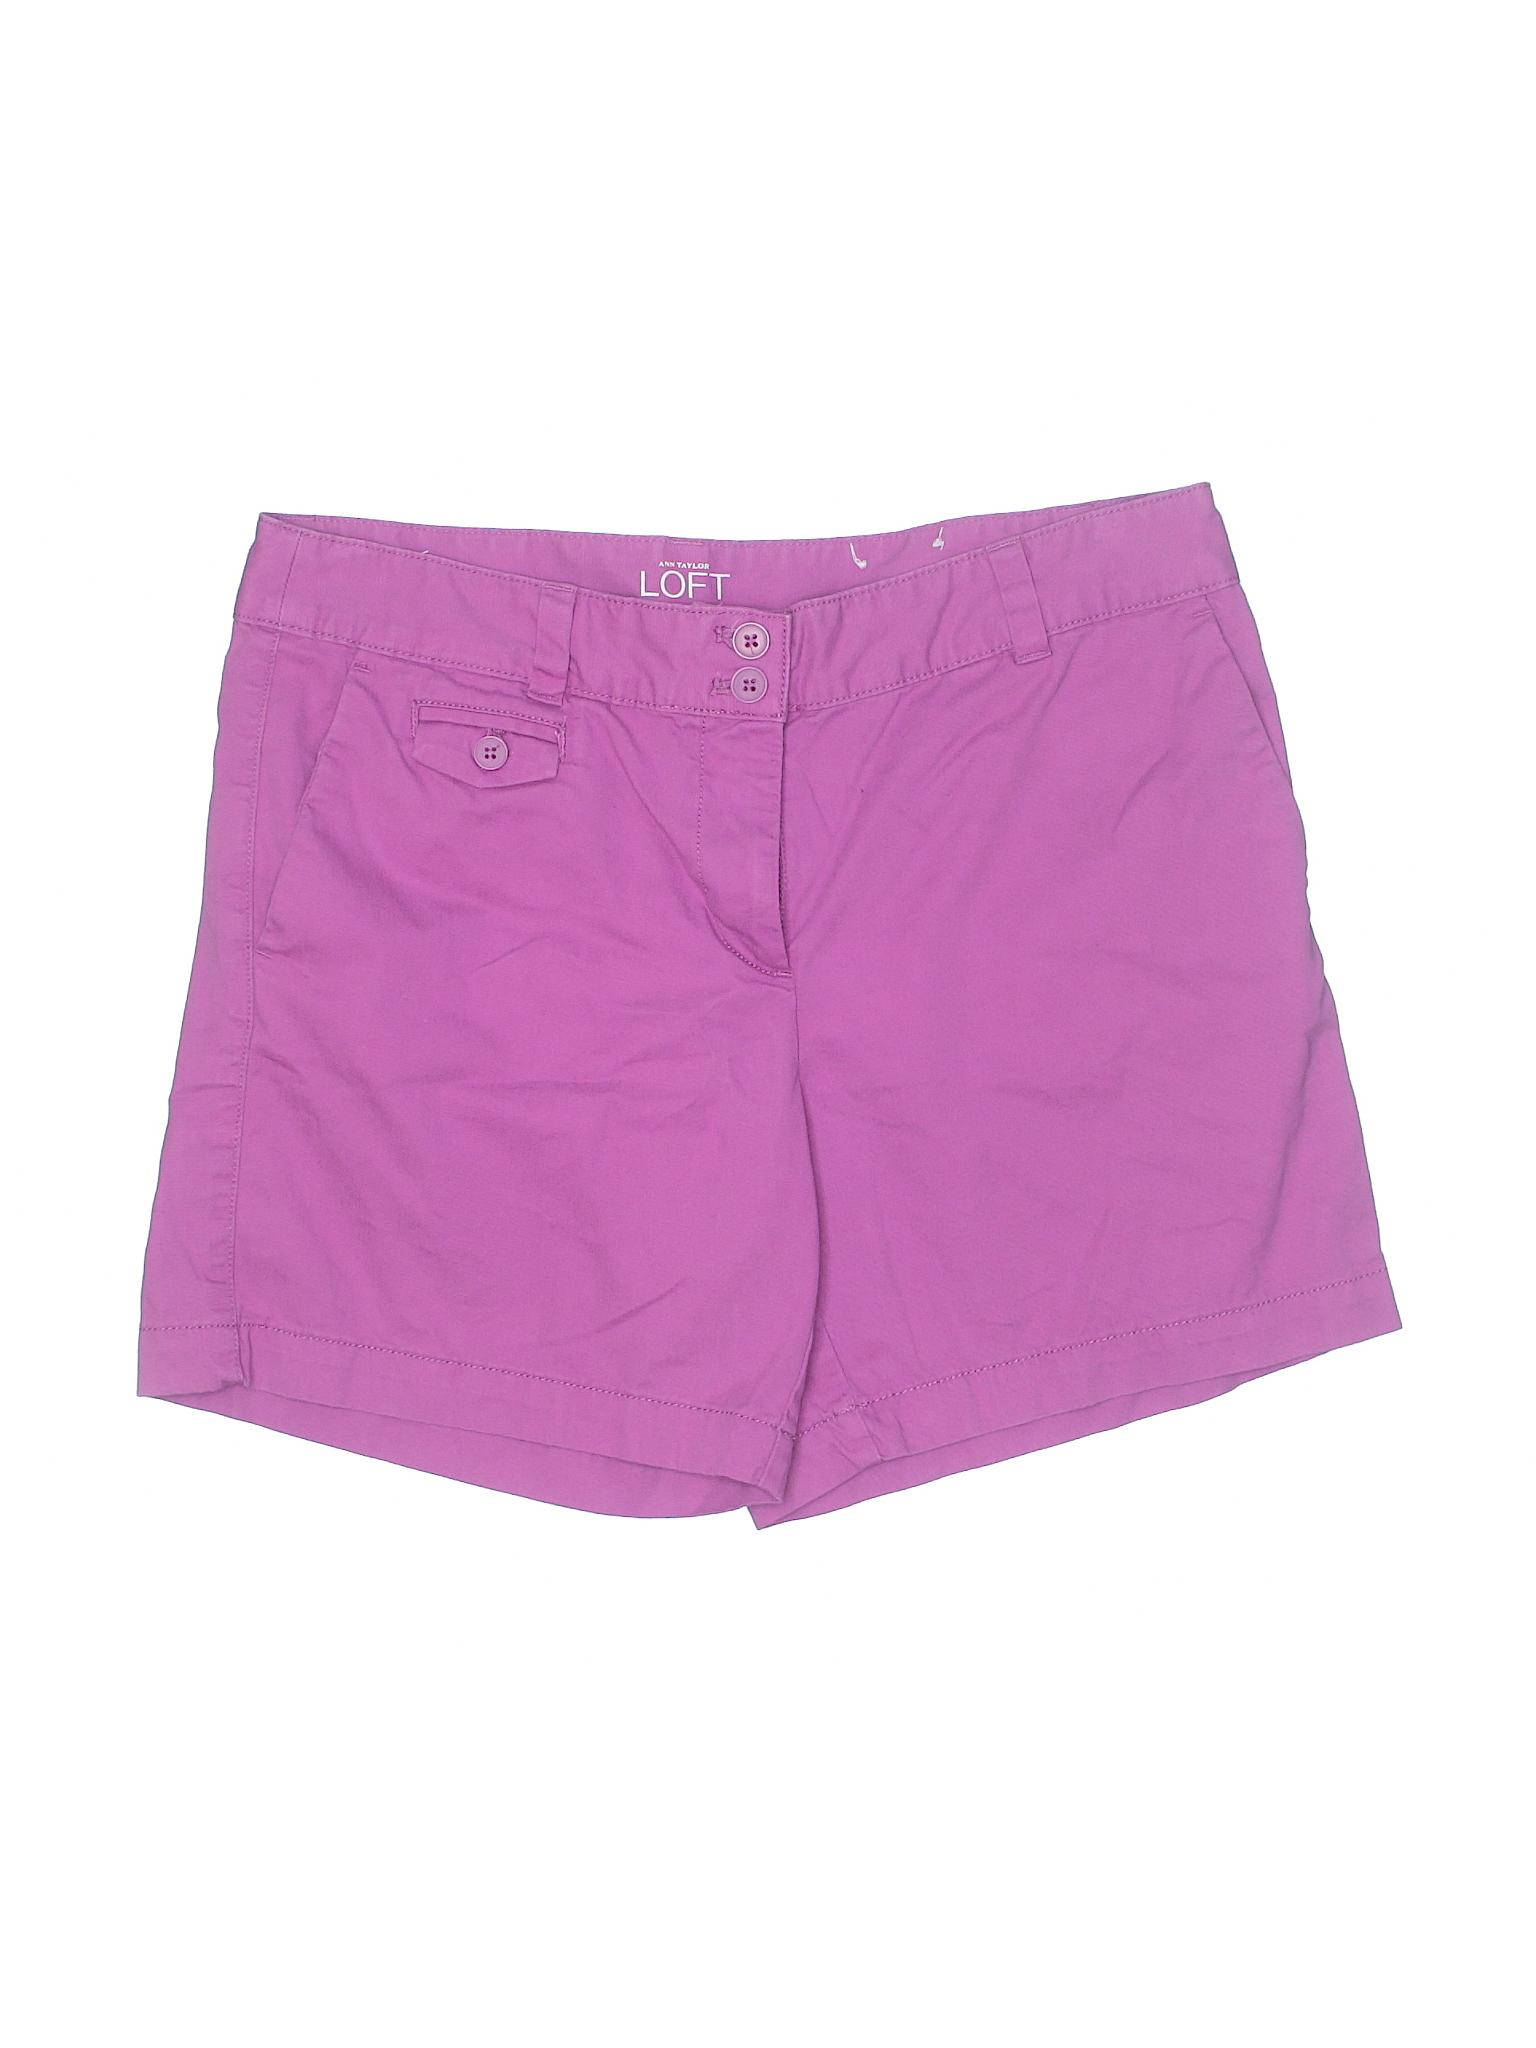 Shorts LOFT Boutique Khaki Taylor Ann wgqOIx6FZ